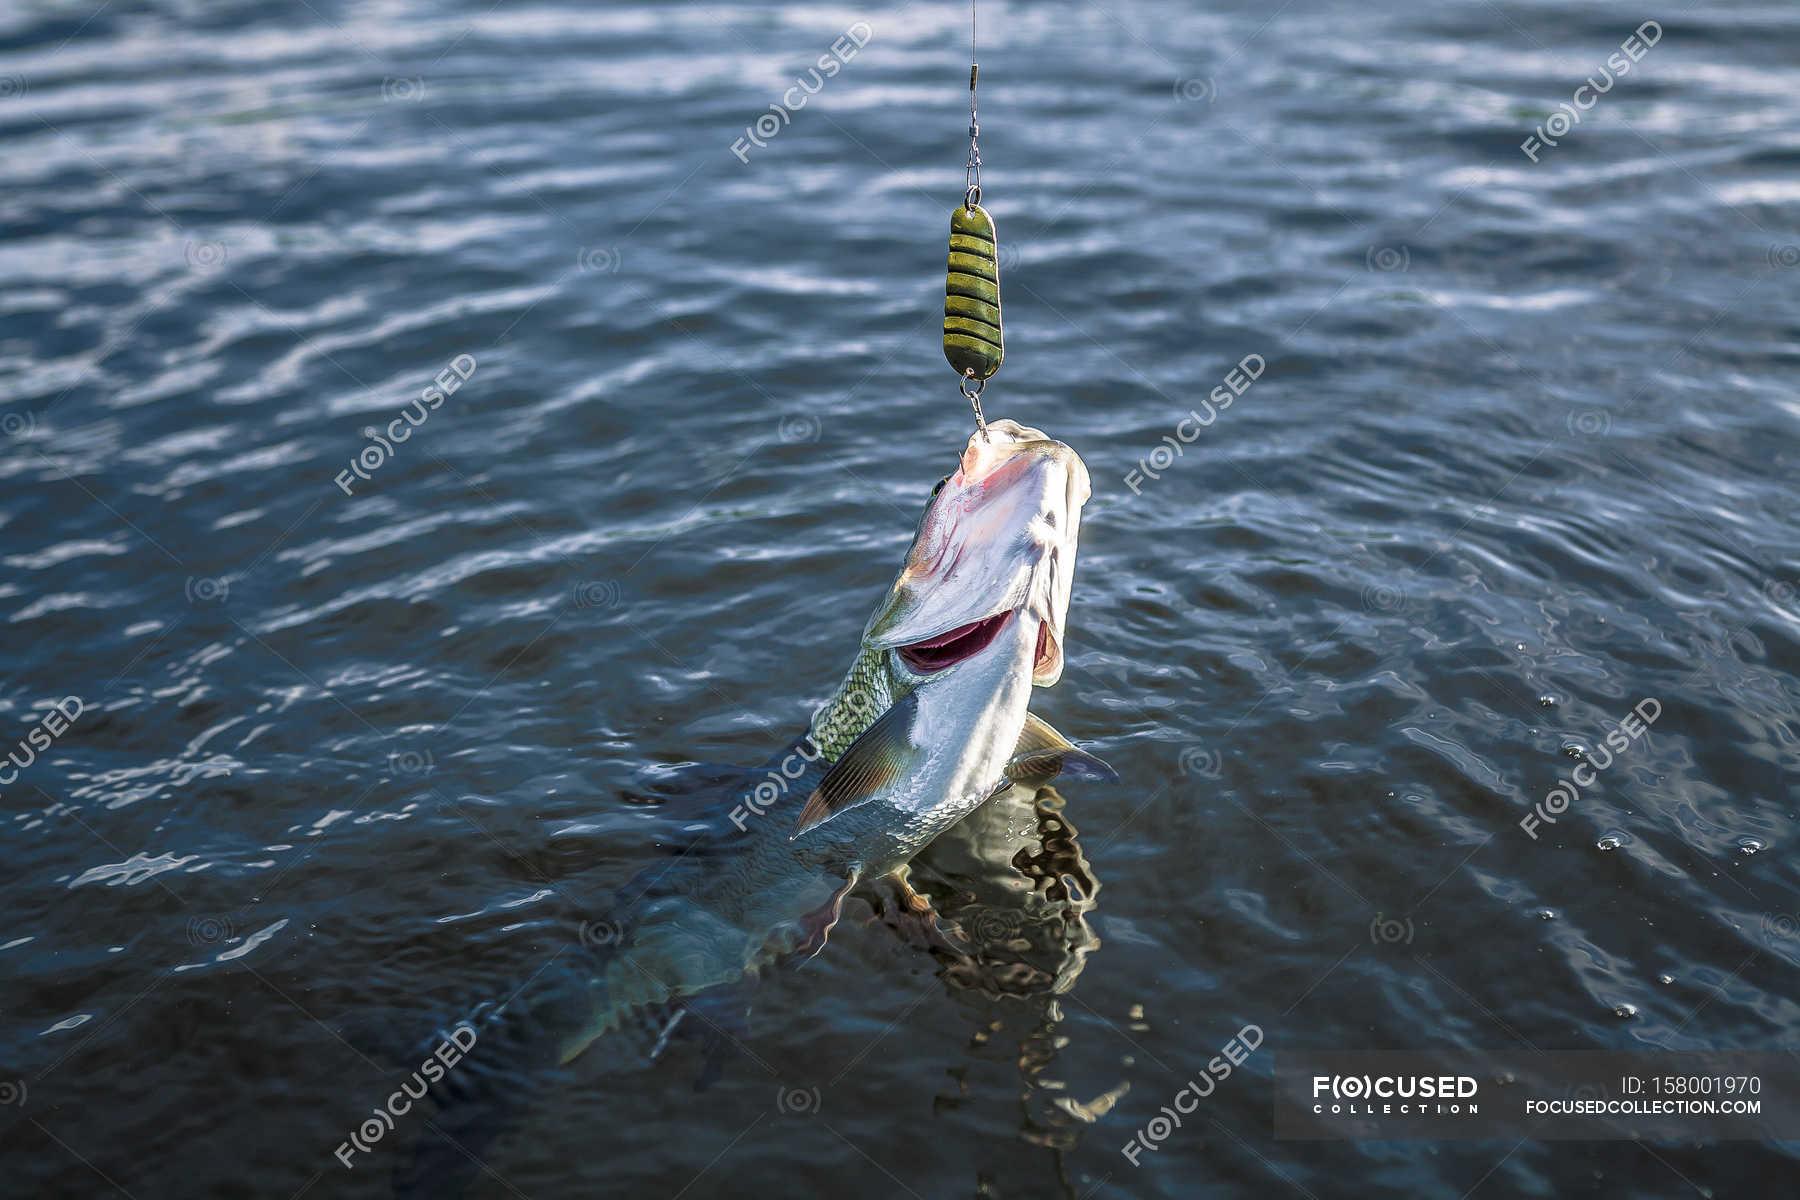 「fish on hook」的圖片搜尋結果